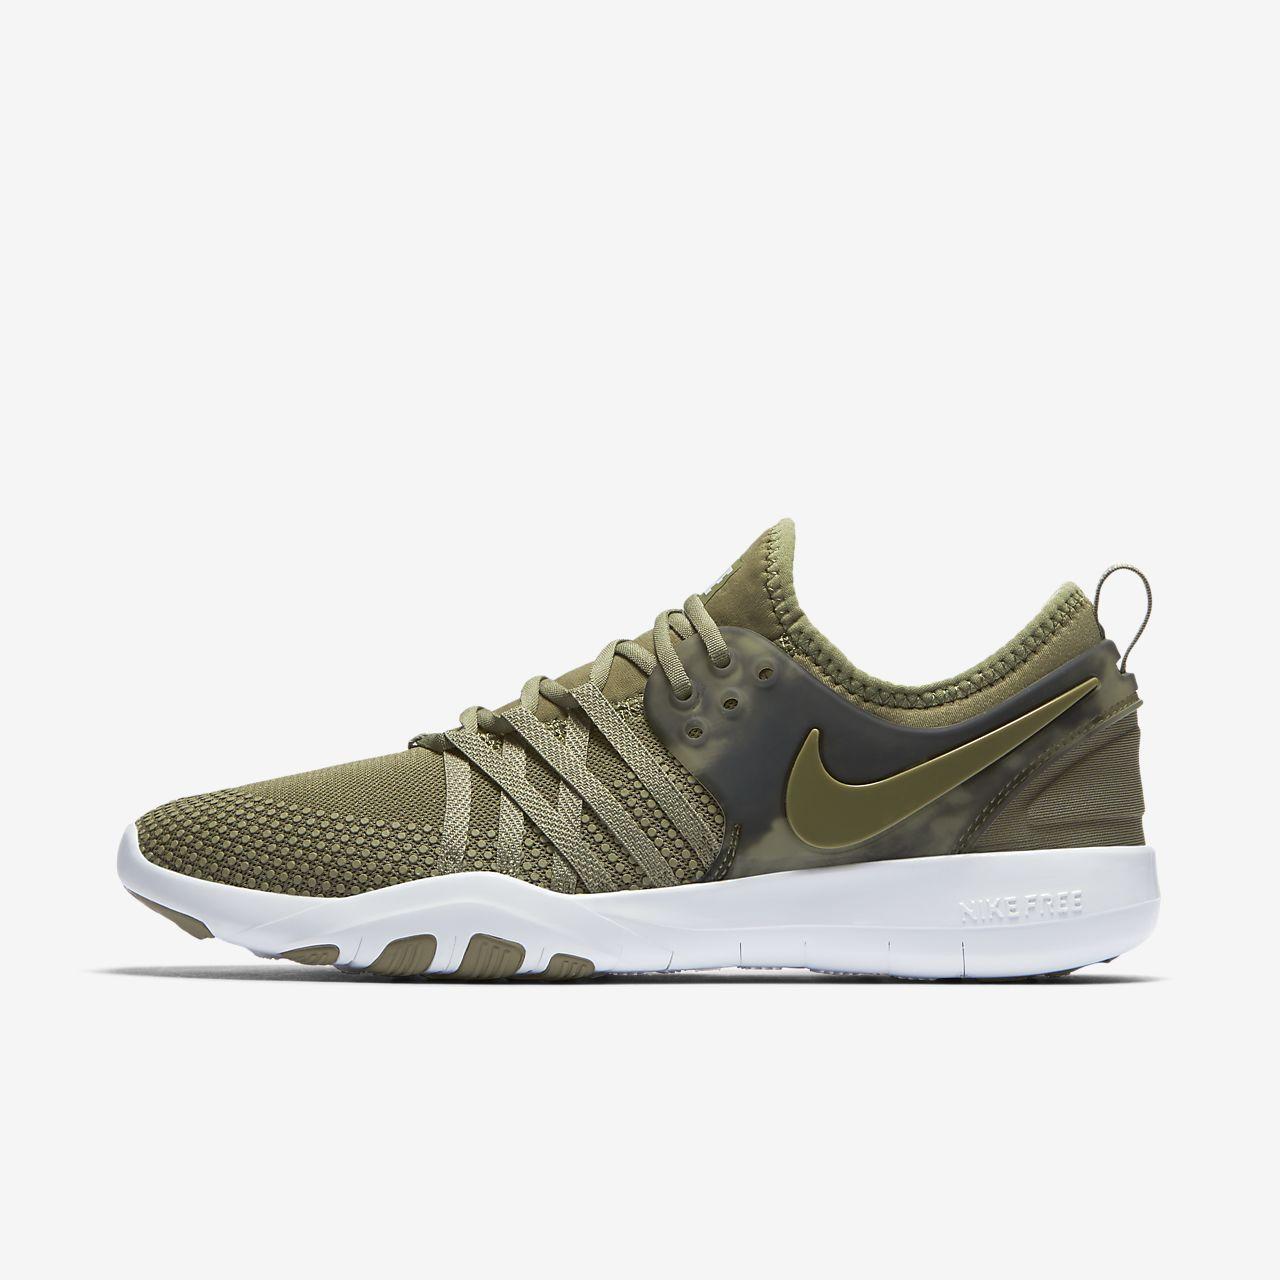 New Nike In Season 6 Trainers Womens Grey/White/Volt Sneakers Sports Shoes Footwear | EBay